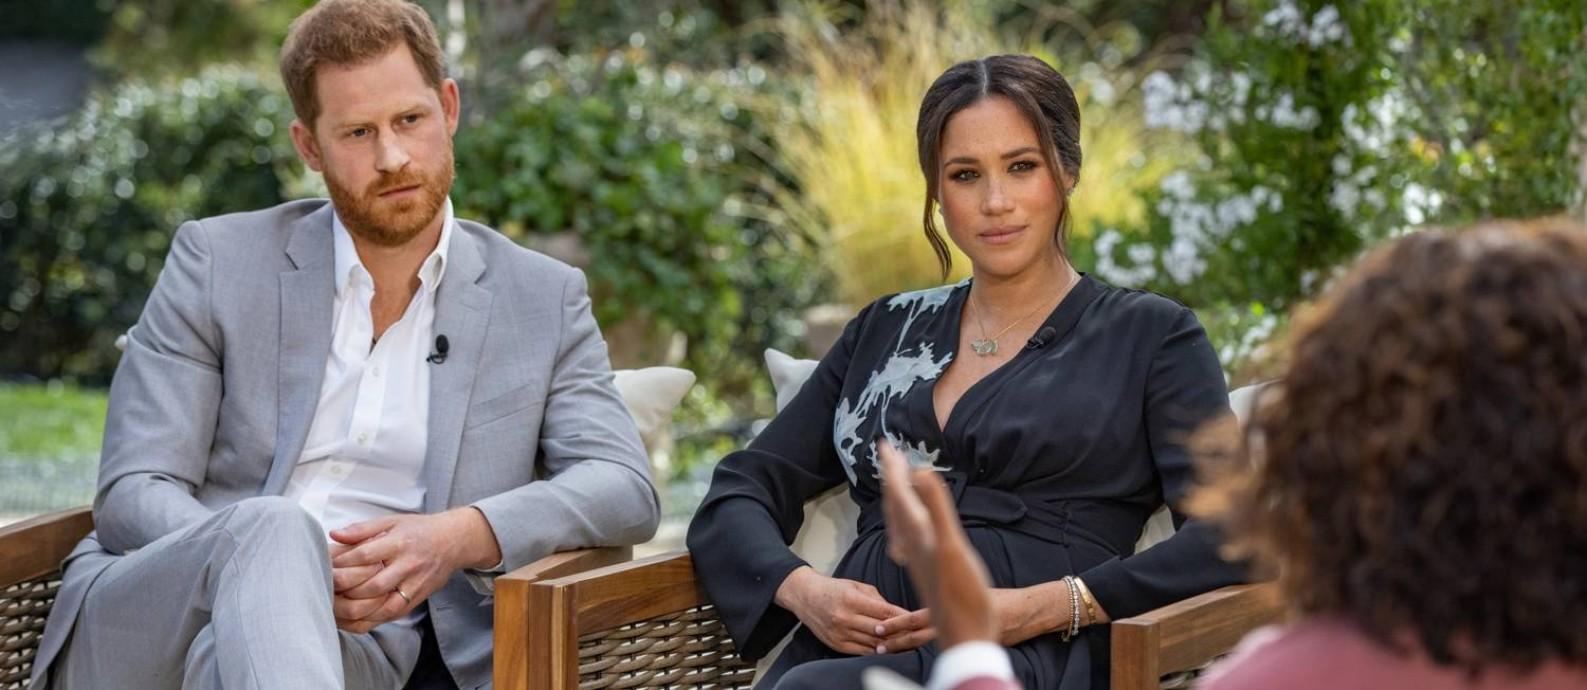 Príncipe Harry e Meghan Markle, durante entrevista à apresentadora Oprah Winfrey Foto: Handout / Harpo Productions/Joe Pugliese v